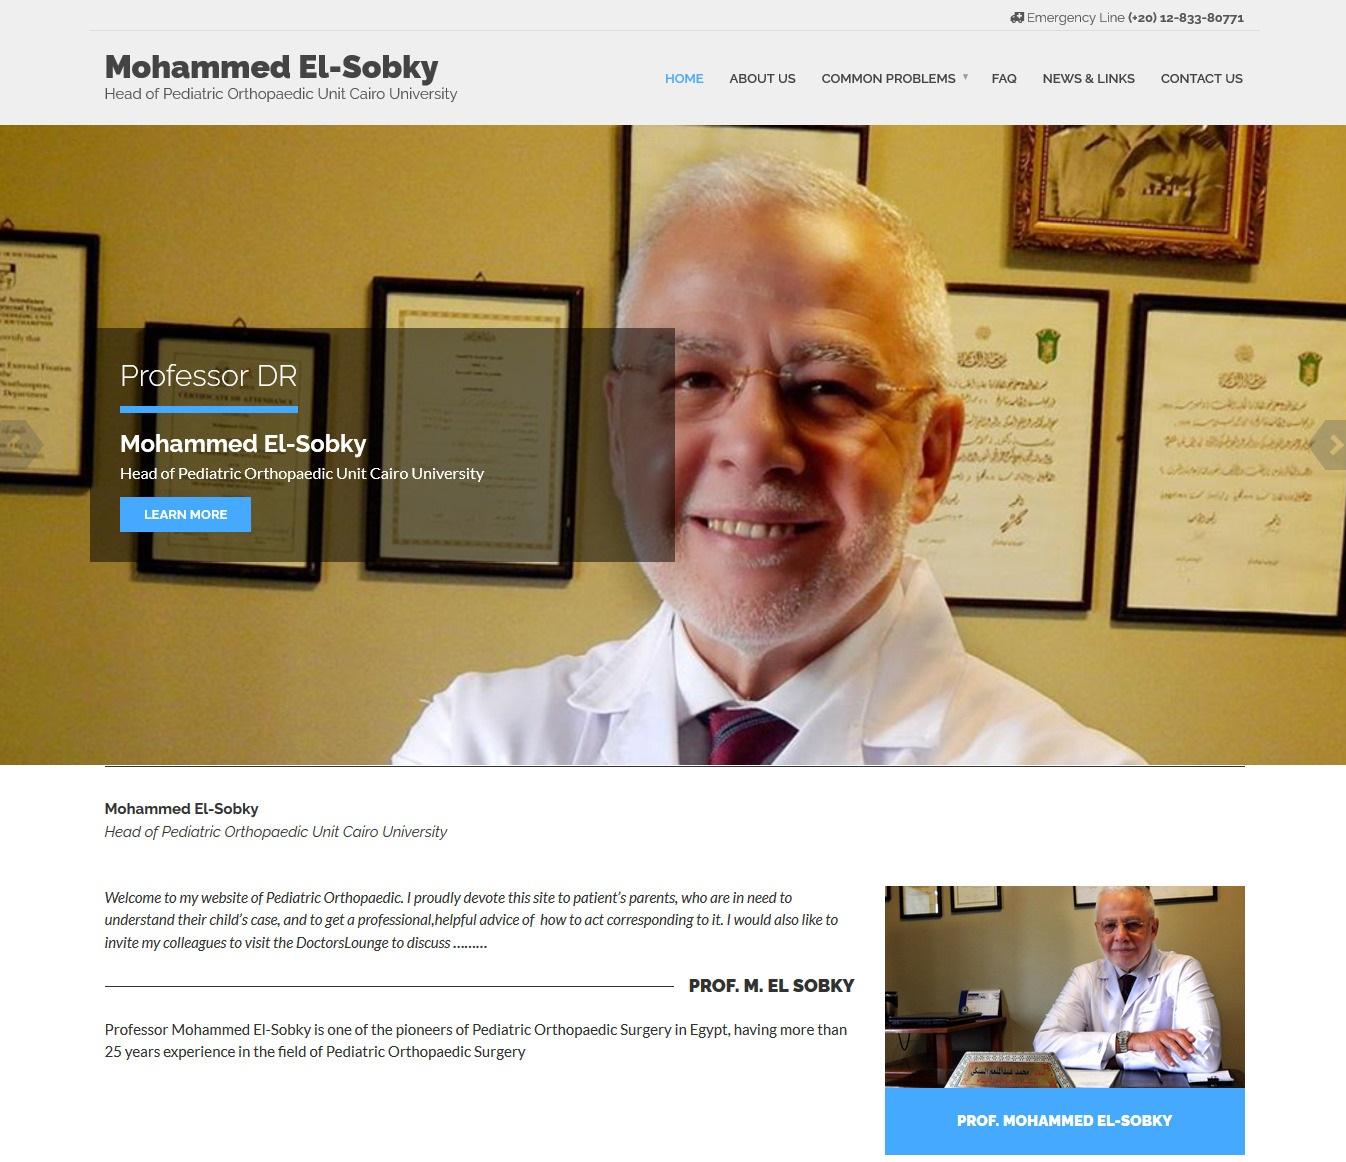 DR Mohamed ElSobky